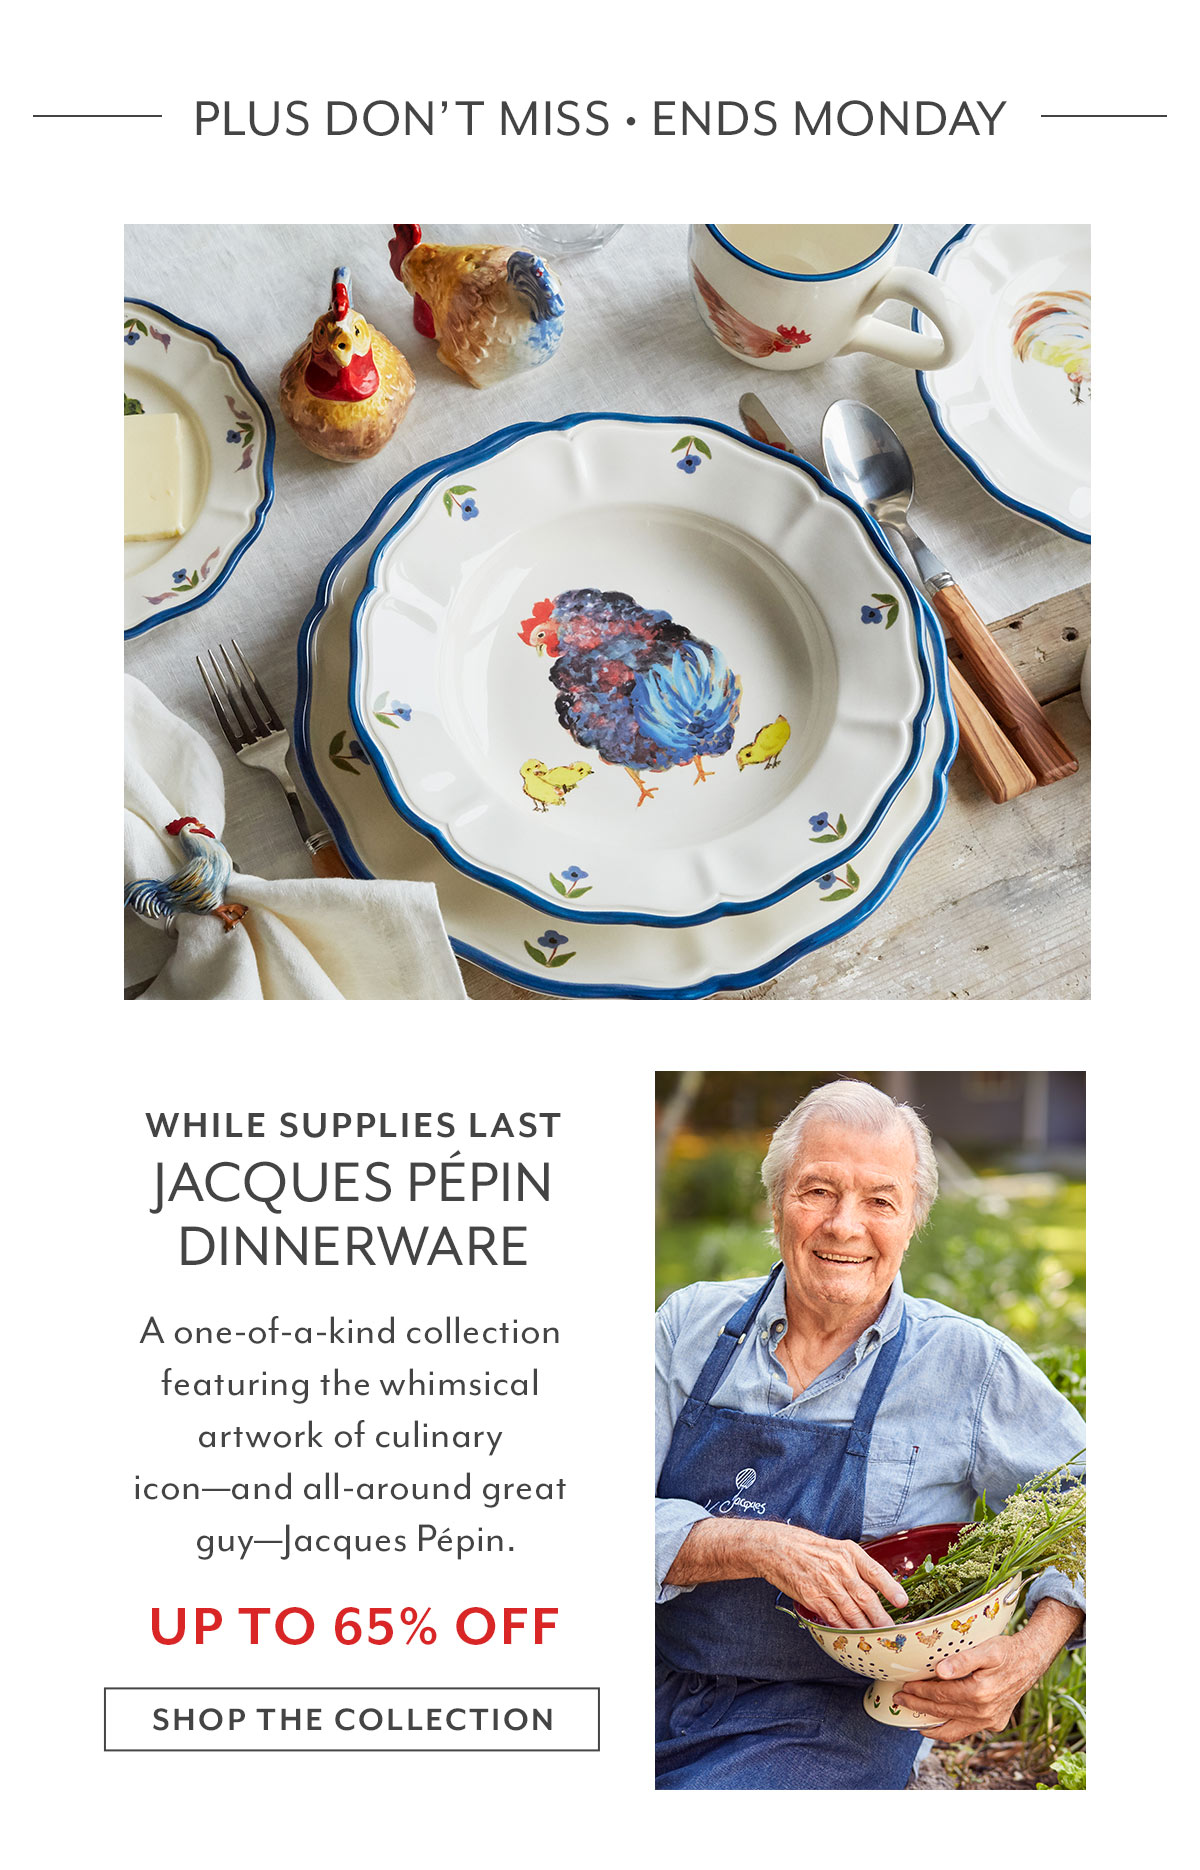 Jacques Pepin Dinnerware